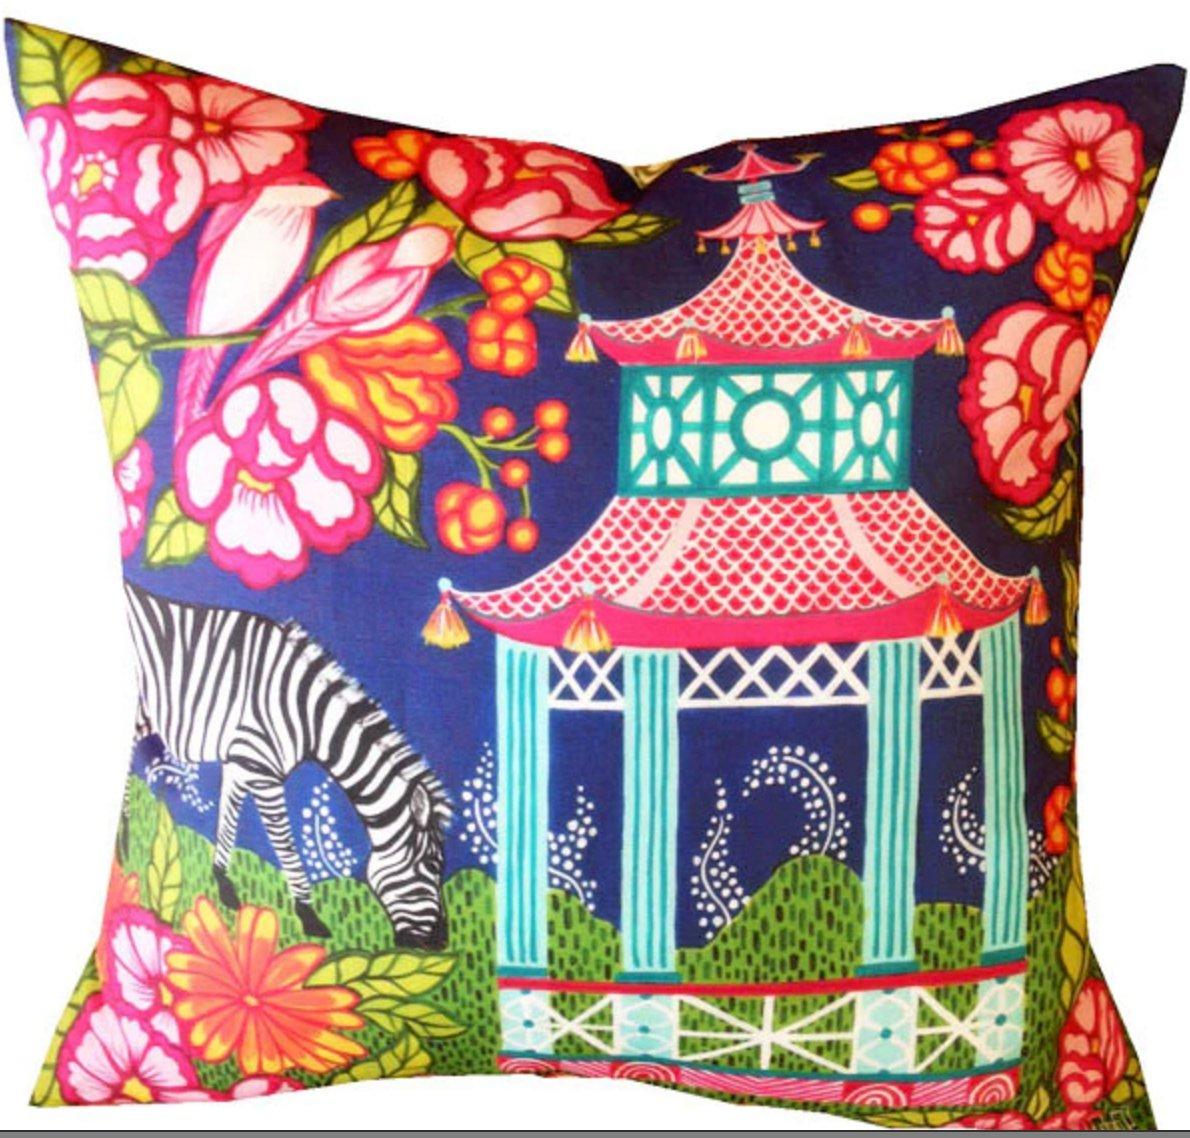 Chinoiserie Garden Pillow. Mari Robeson